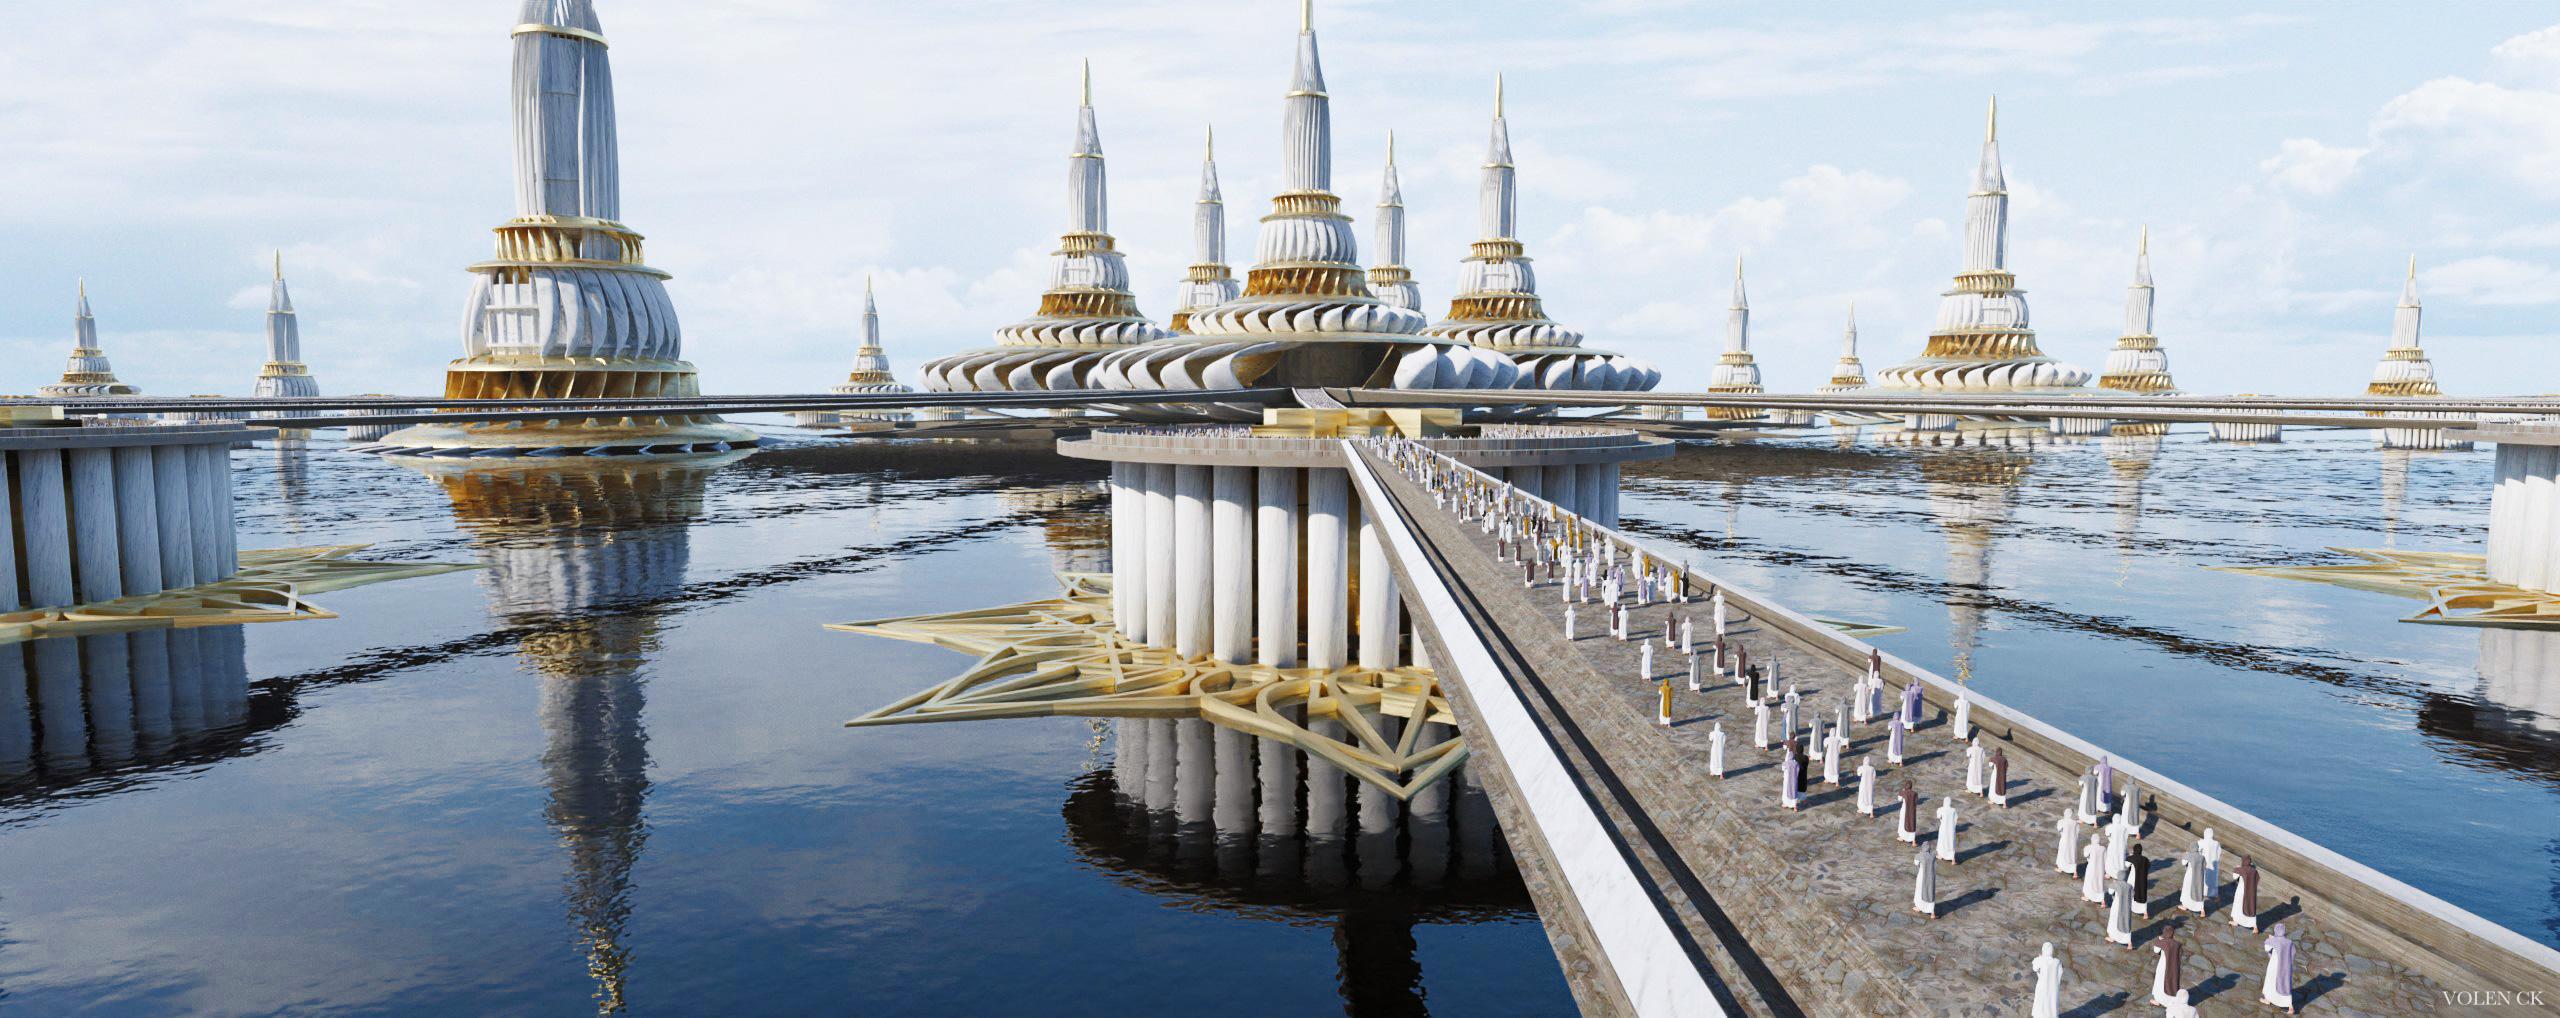 The-White-Temple-Pilgrims—Volen-CK—04